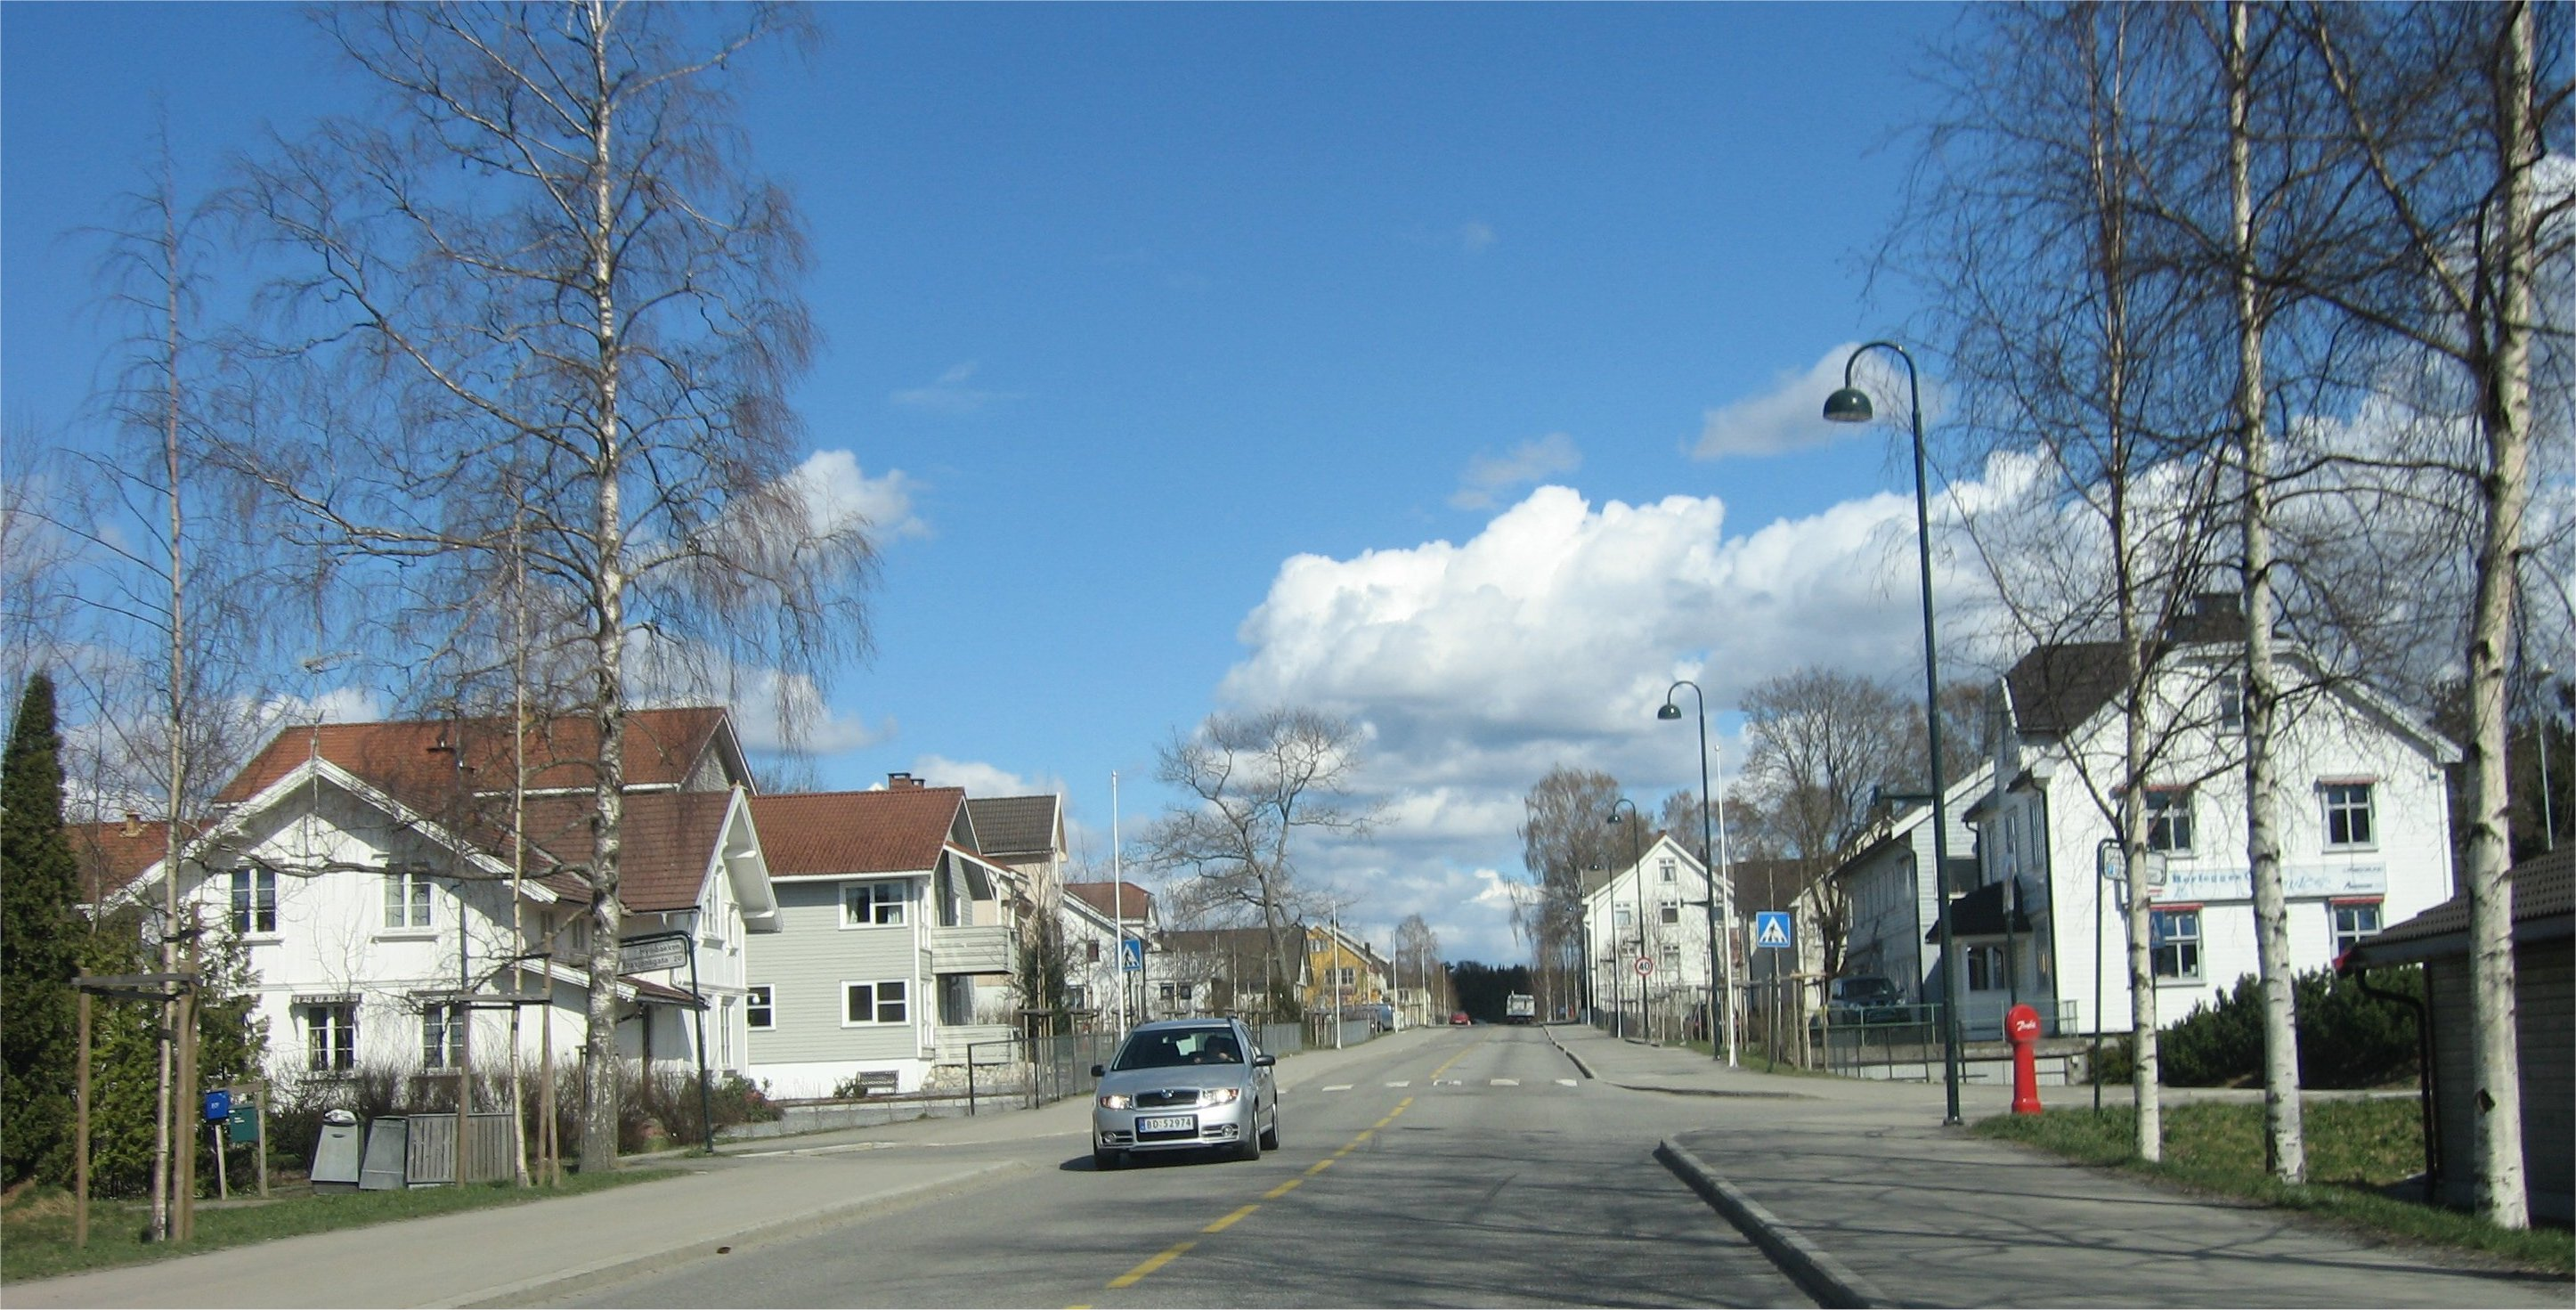 c0db9cd4 ... Spydeberg kommune · Har gata di endret navn?